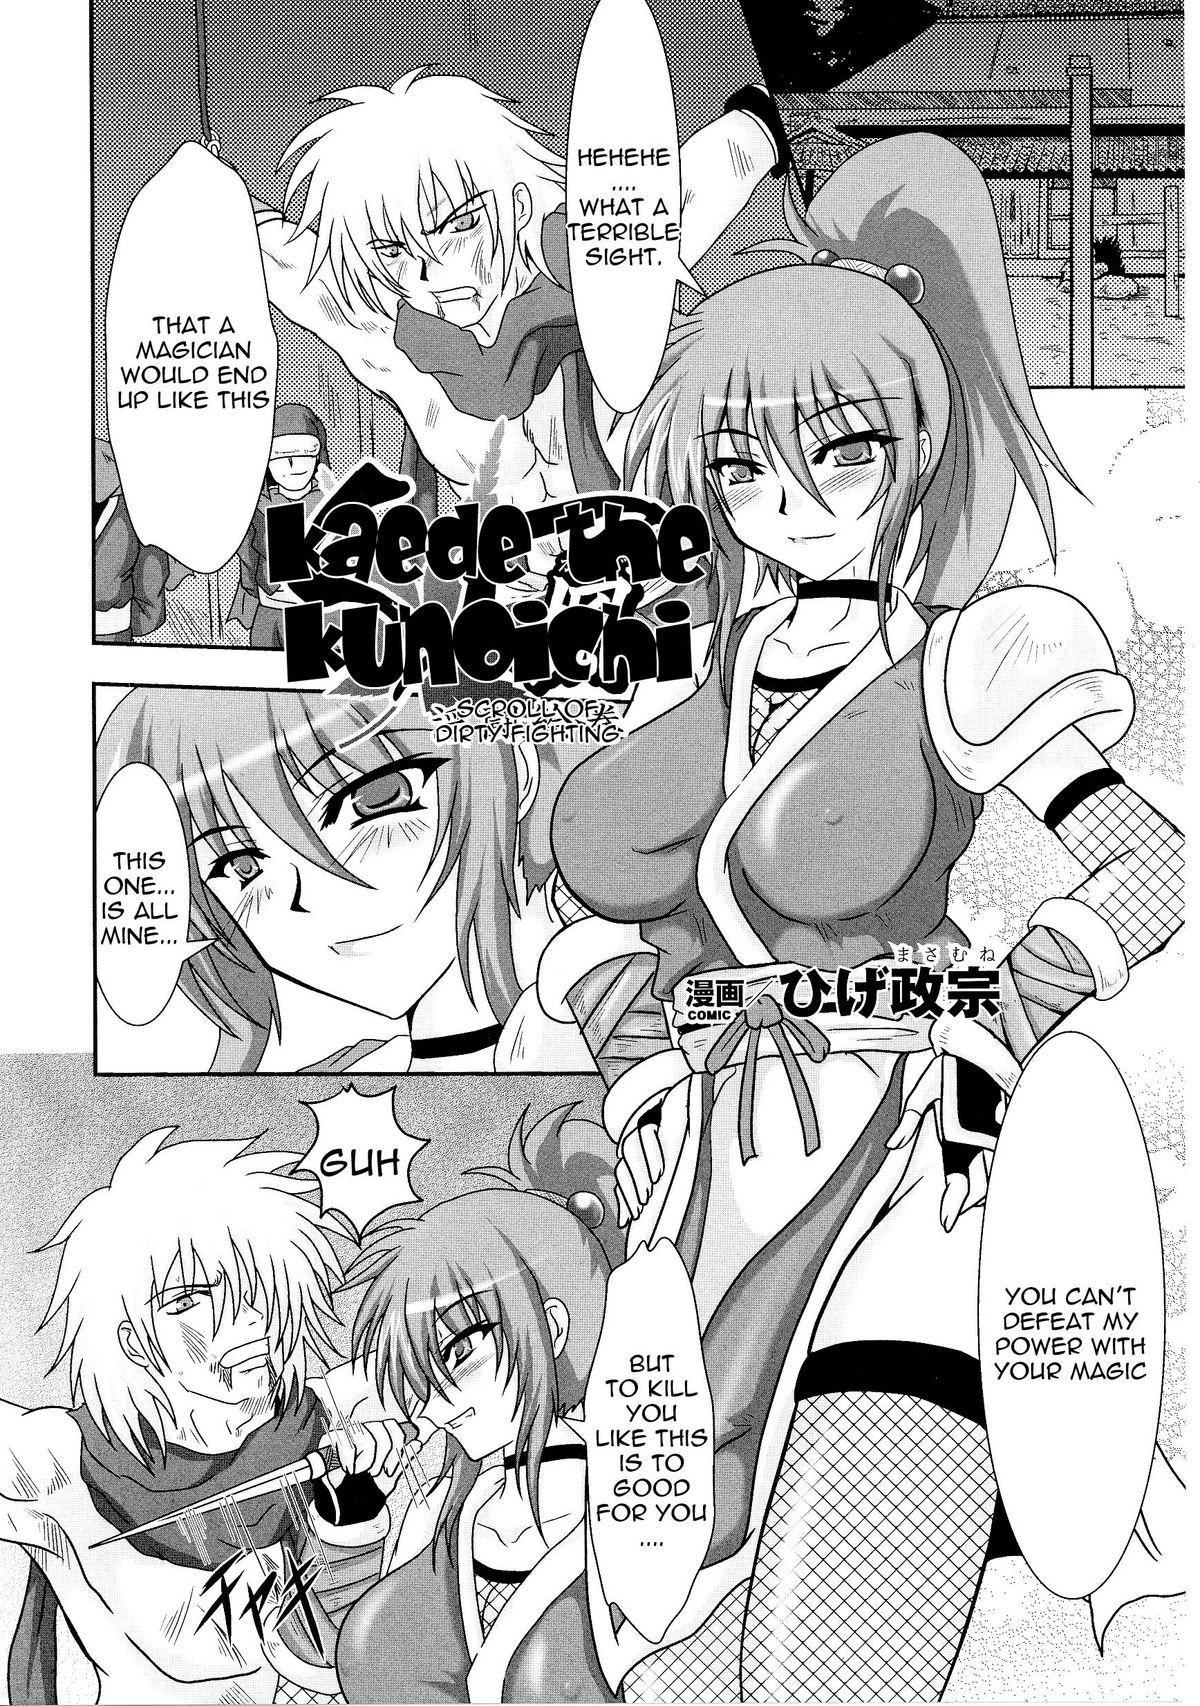 Kunoichi Kaede Intou Emaki 0